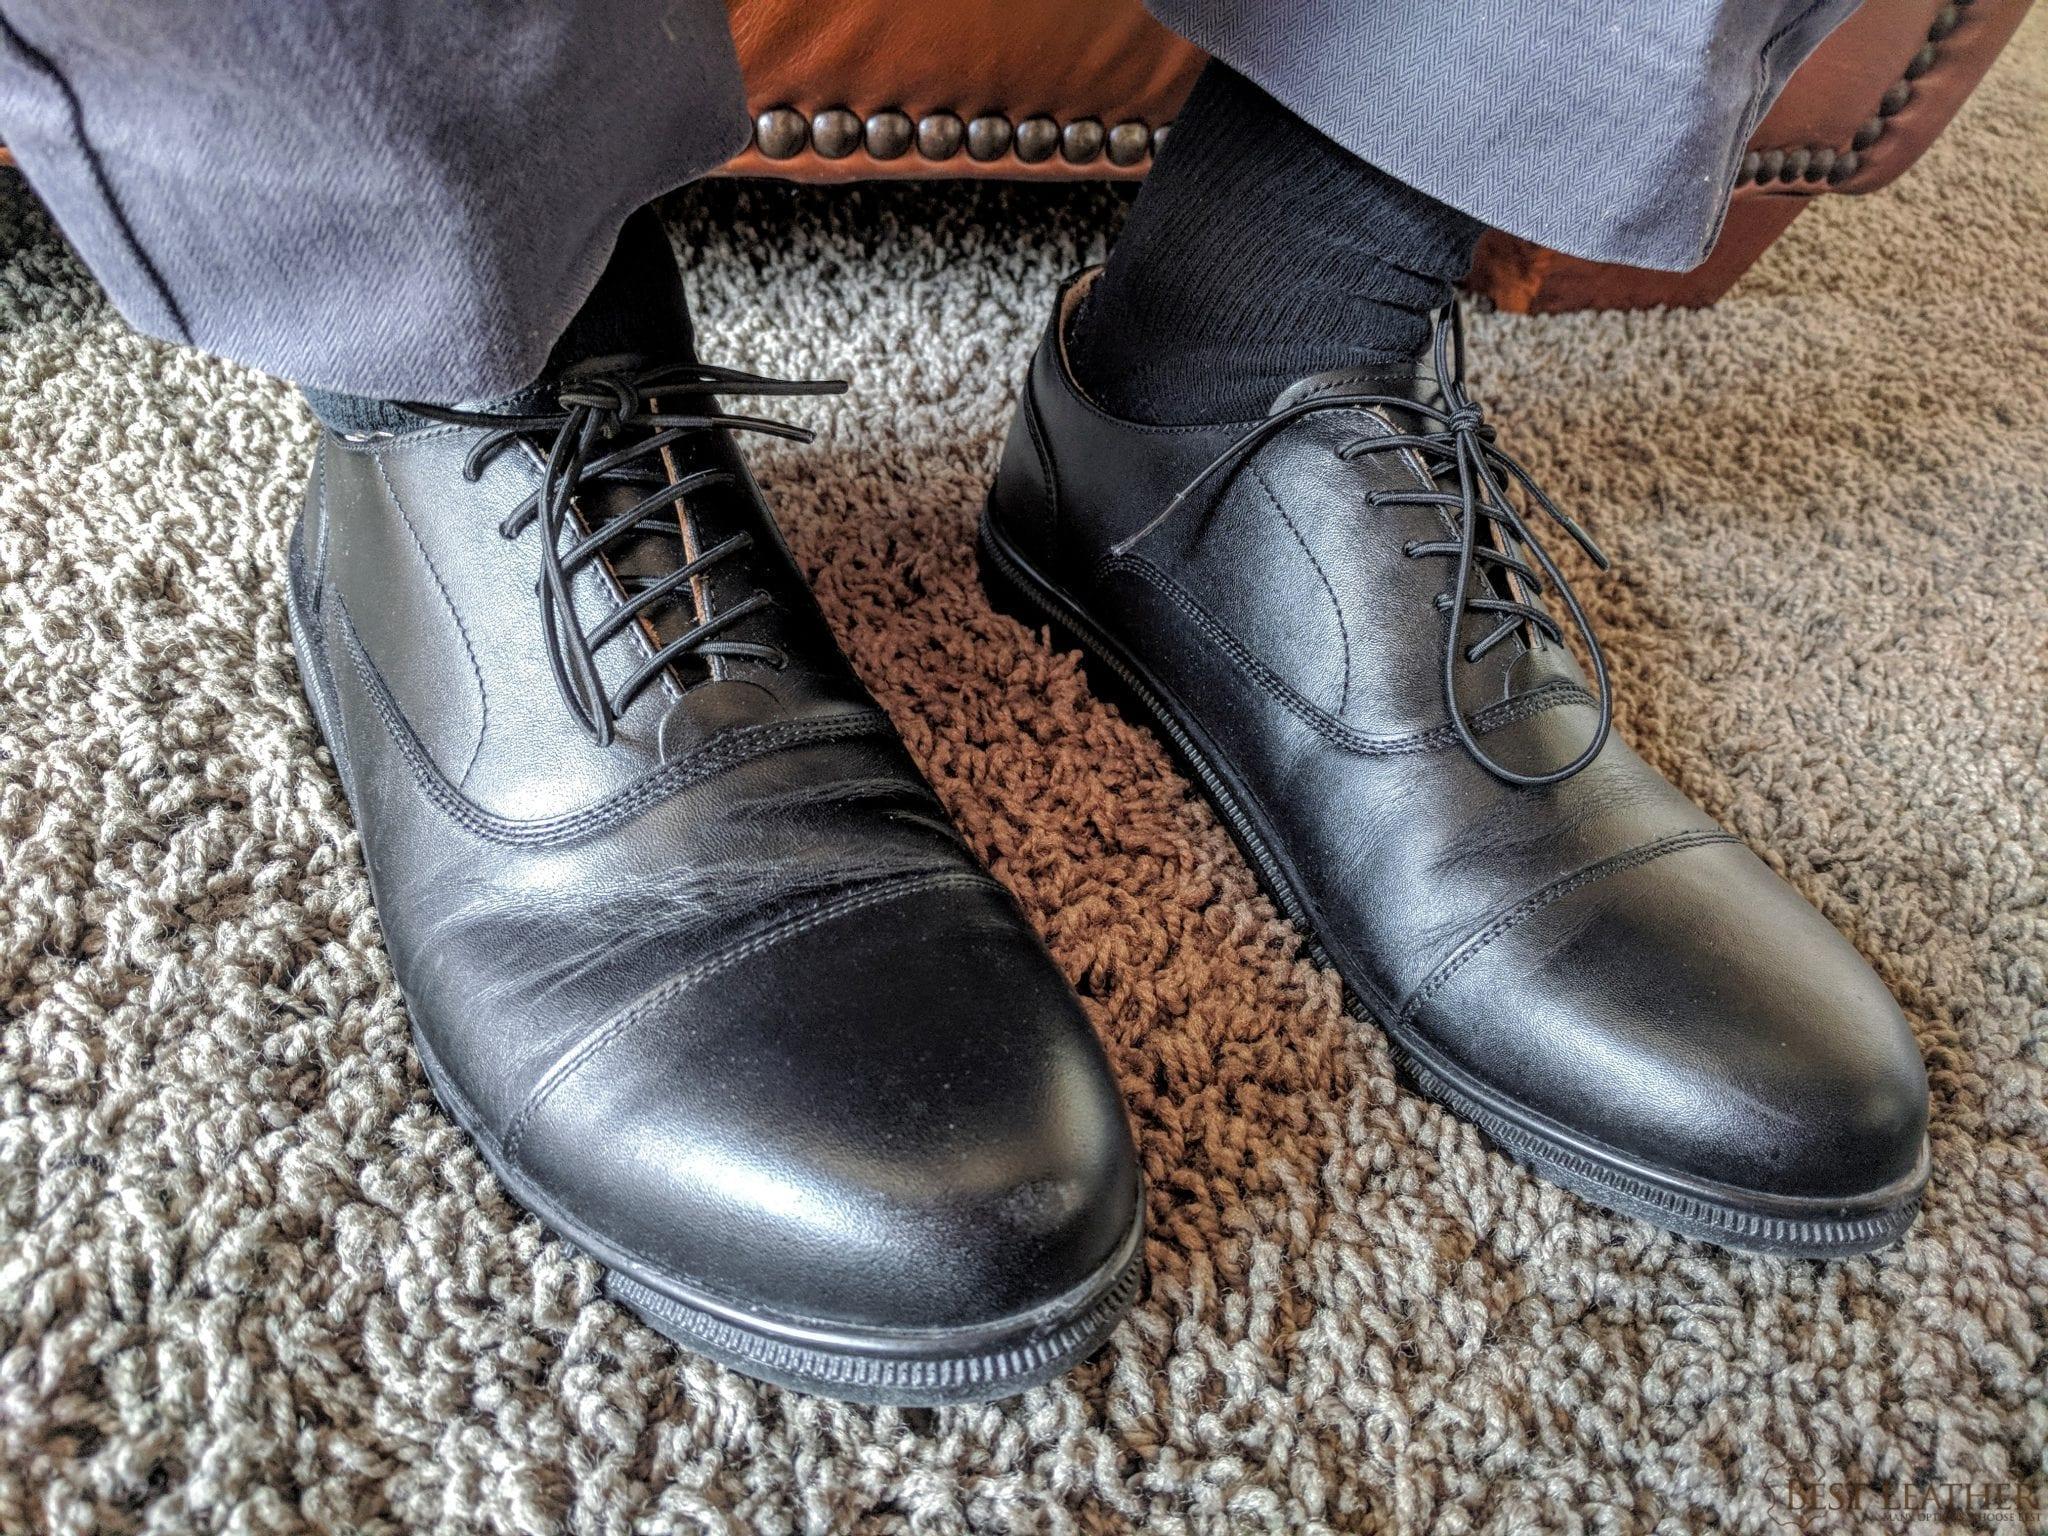 Carets Minimalist Fer Oxford Leather Shoe Review 350